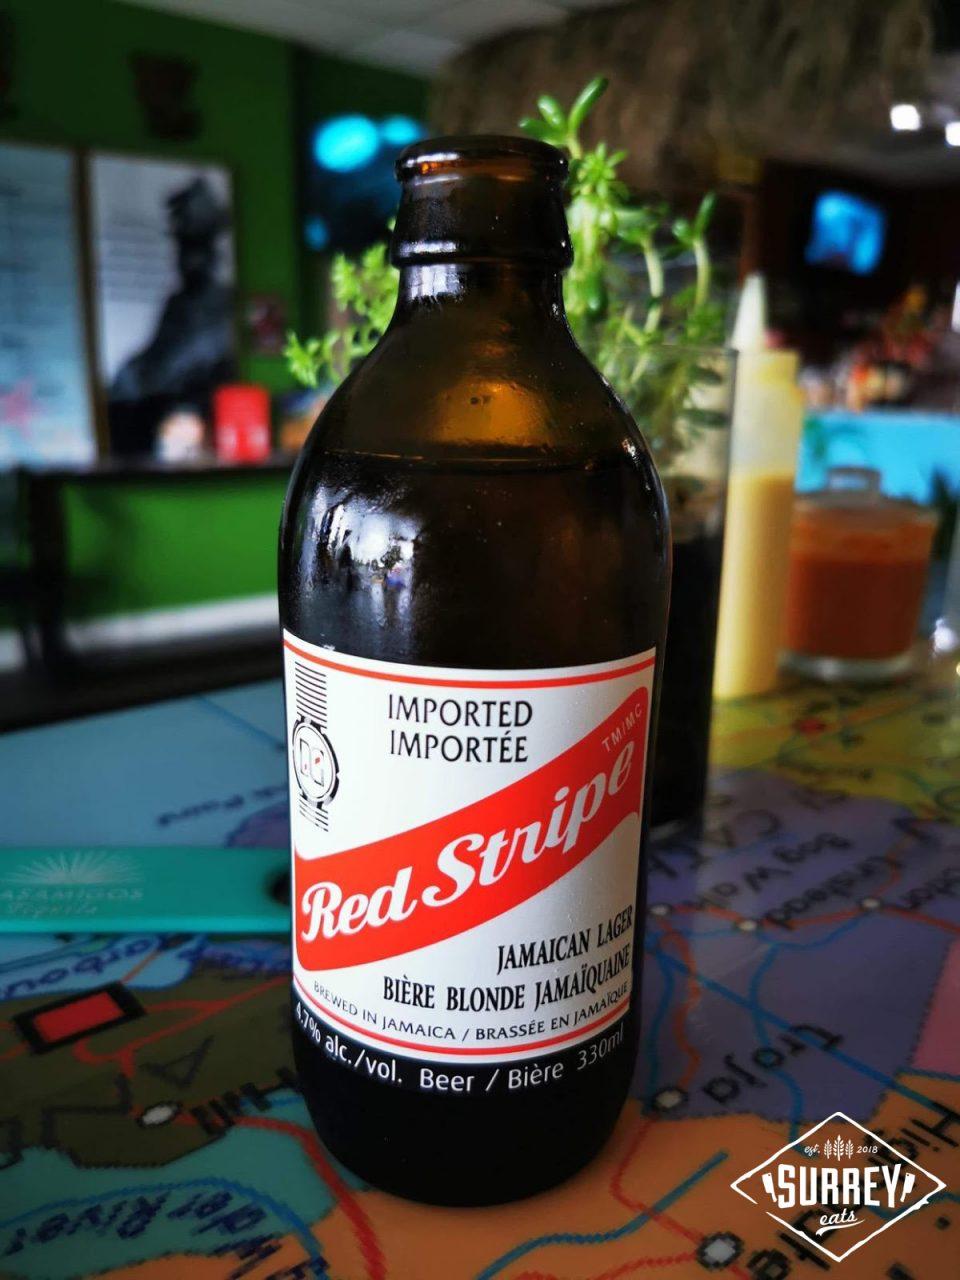 Bottle of red stripe lager beer